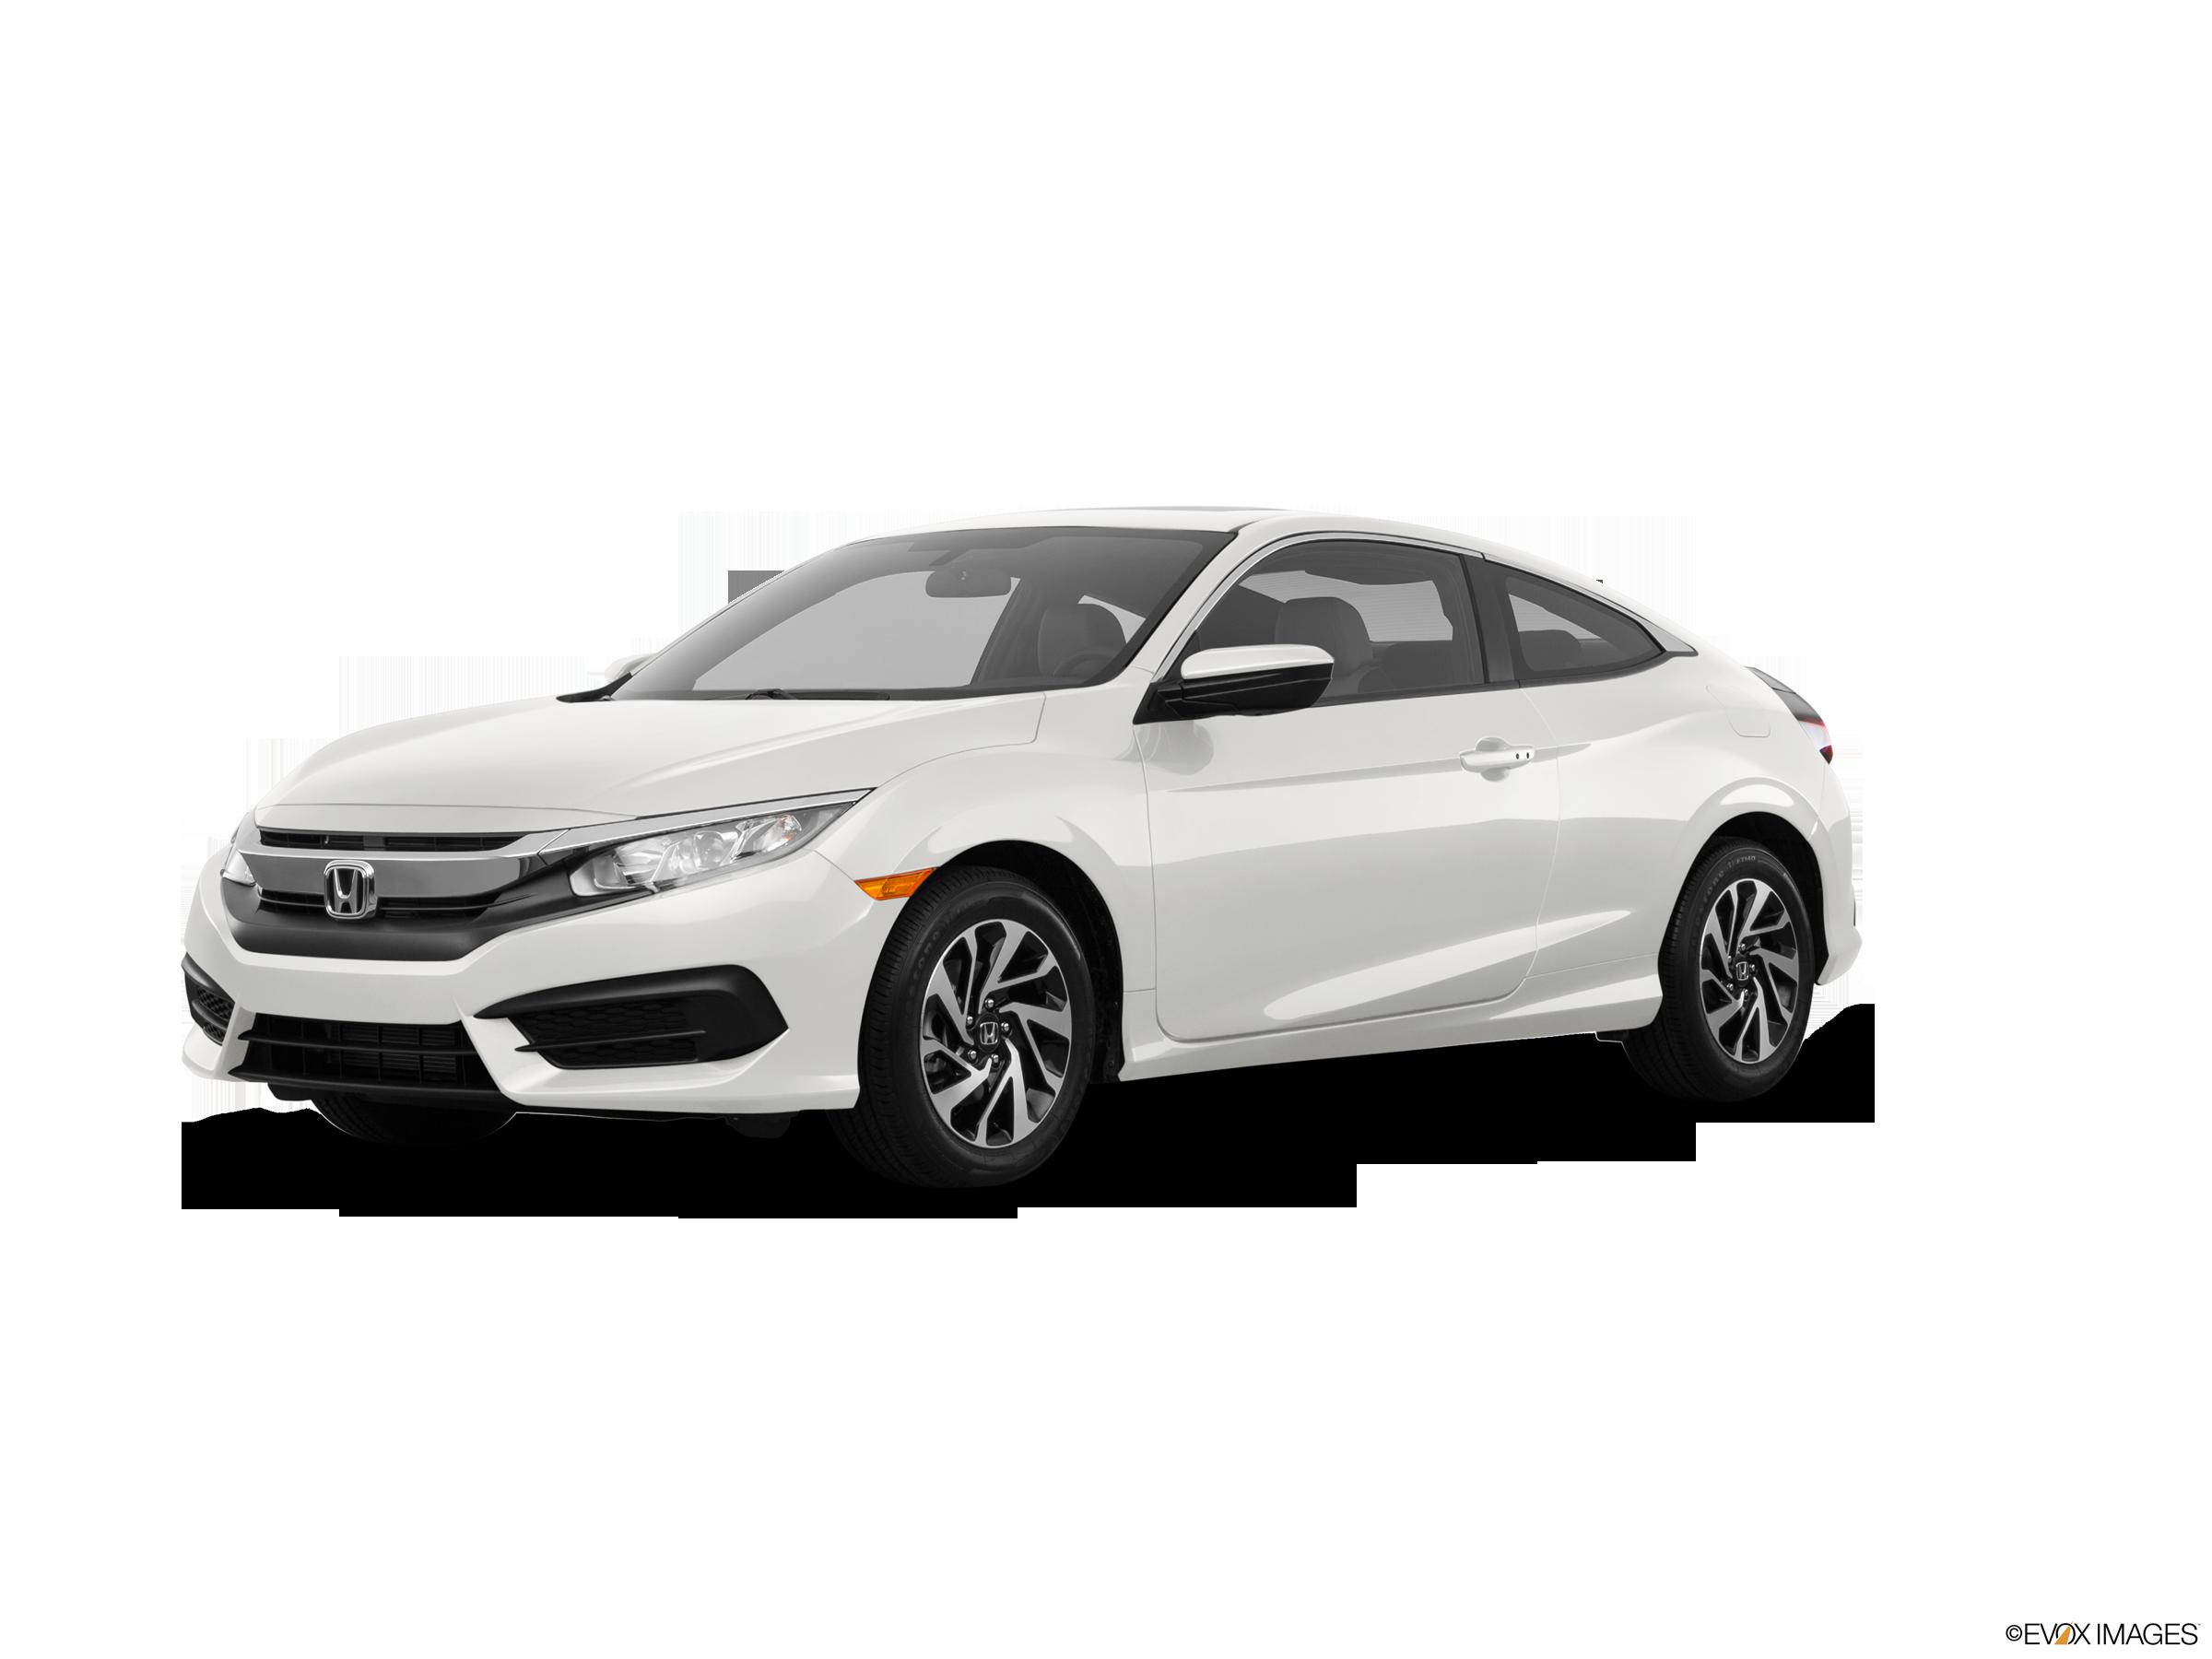 2018 Honda Civic Values Cars For Sale Kelley Blue Book